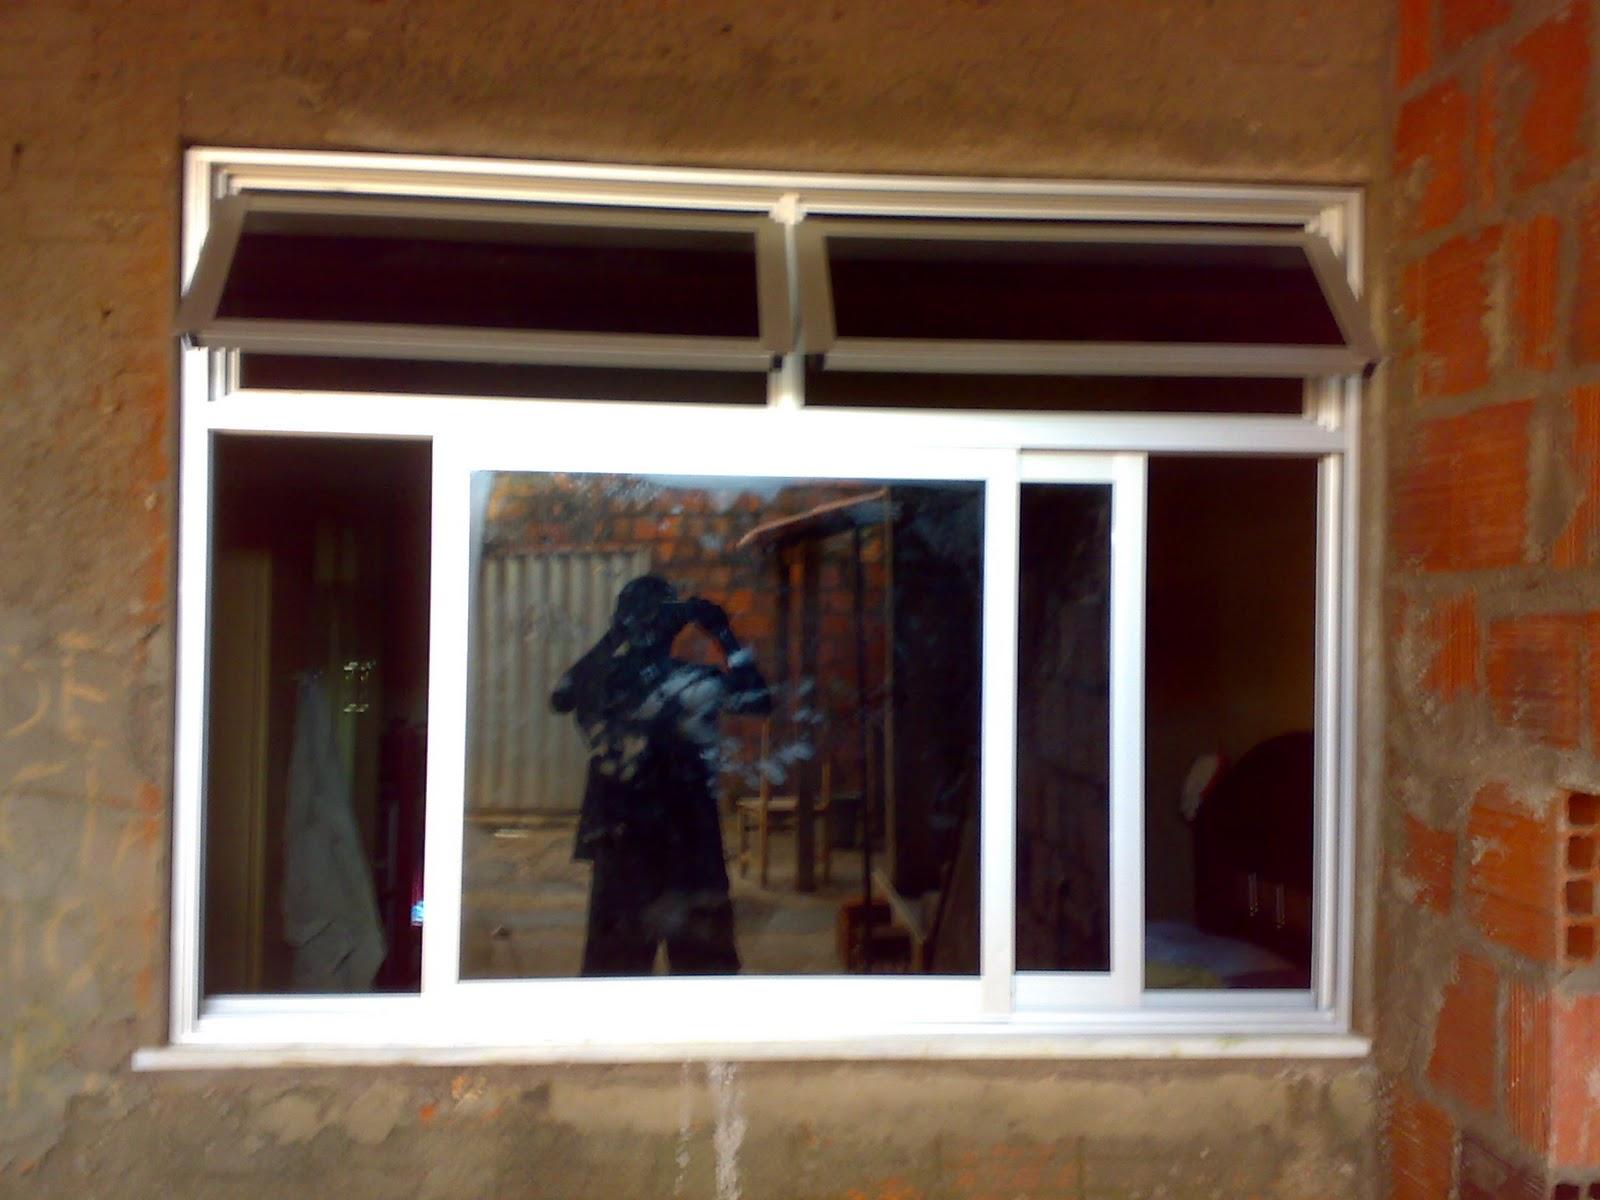 #6F4020 Janela alumínio fosco com maxi ar vidro com película fume 732 Janelas Vidro Fosco